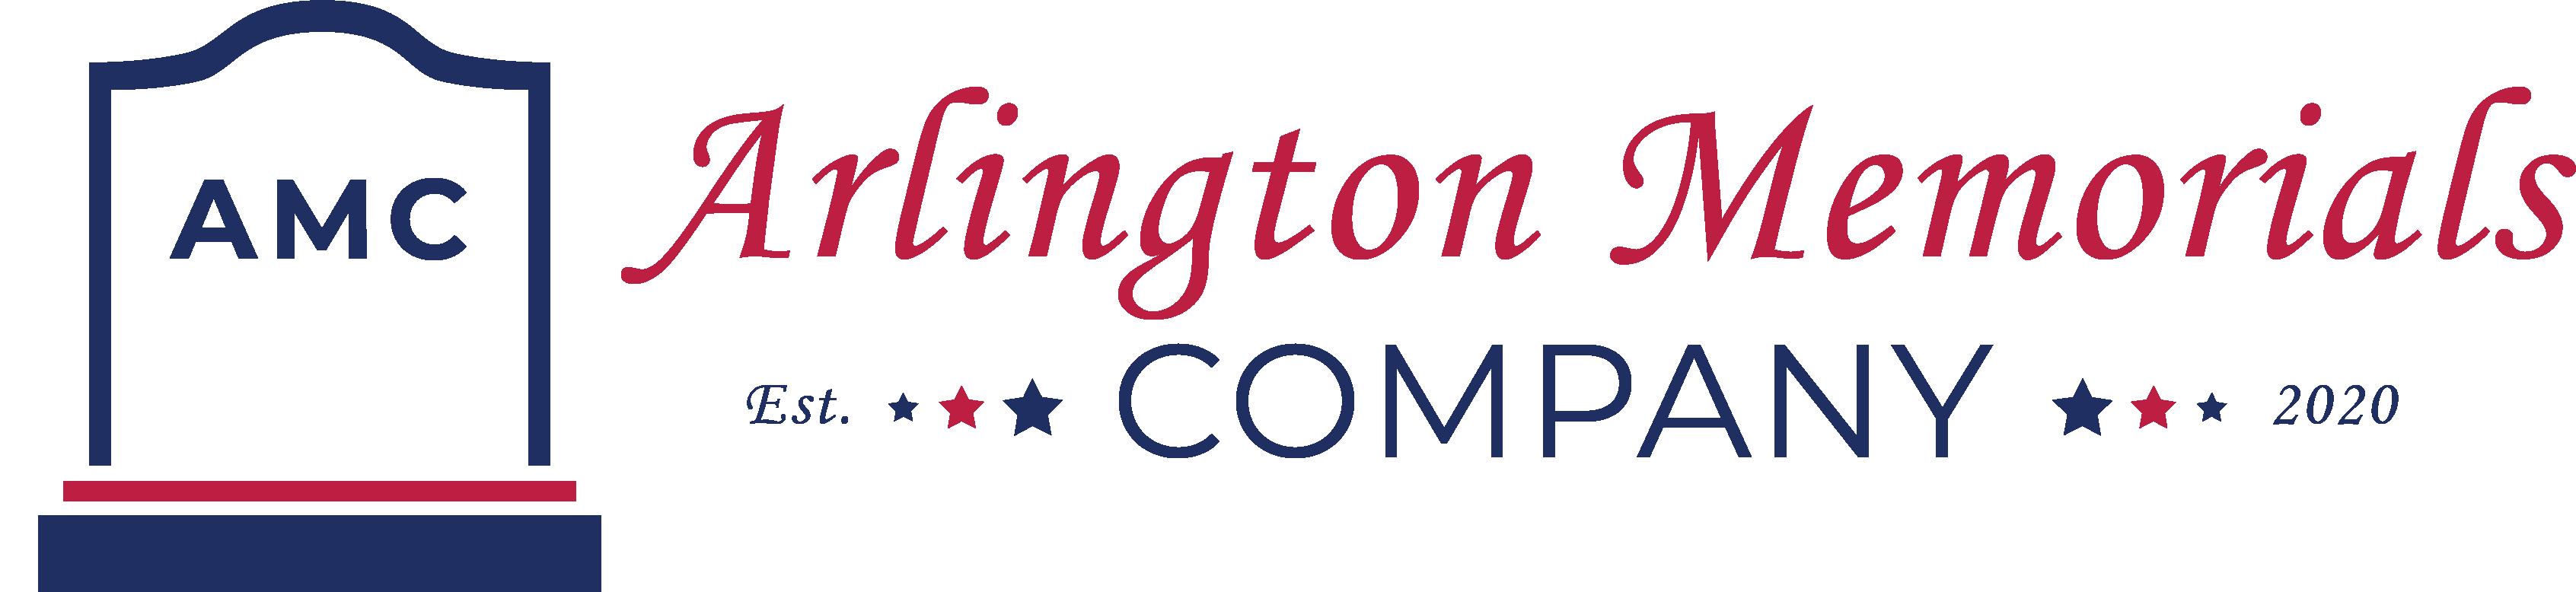 Arlington Memorials Company Logo